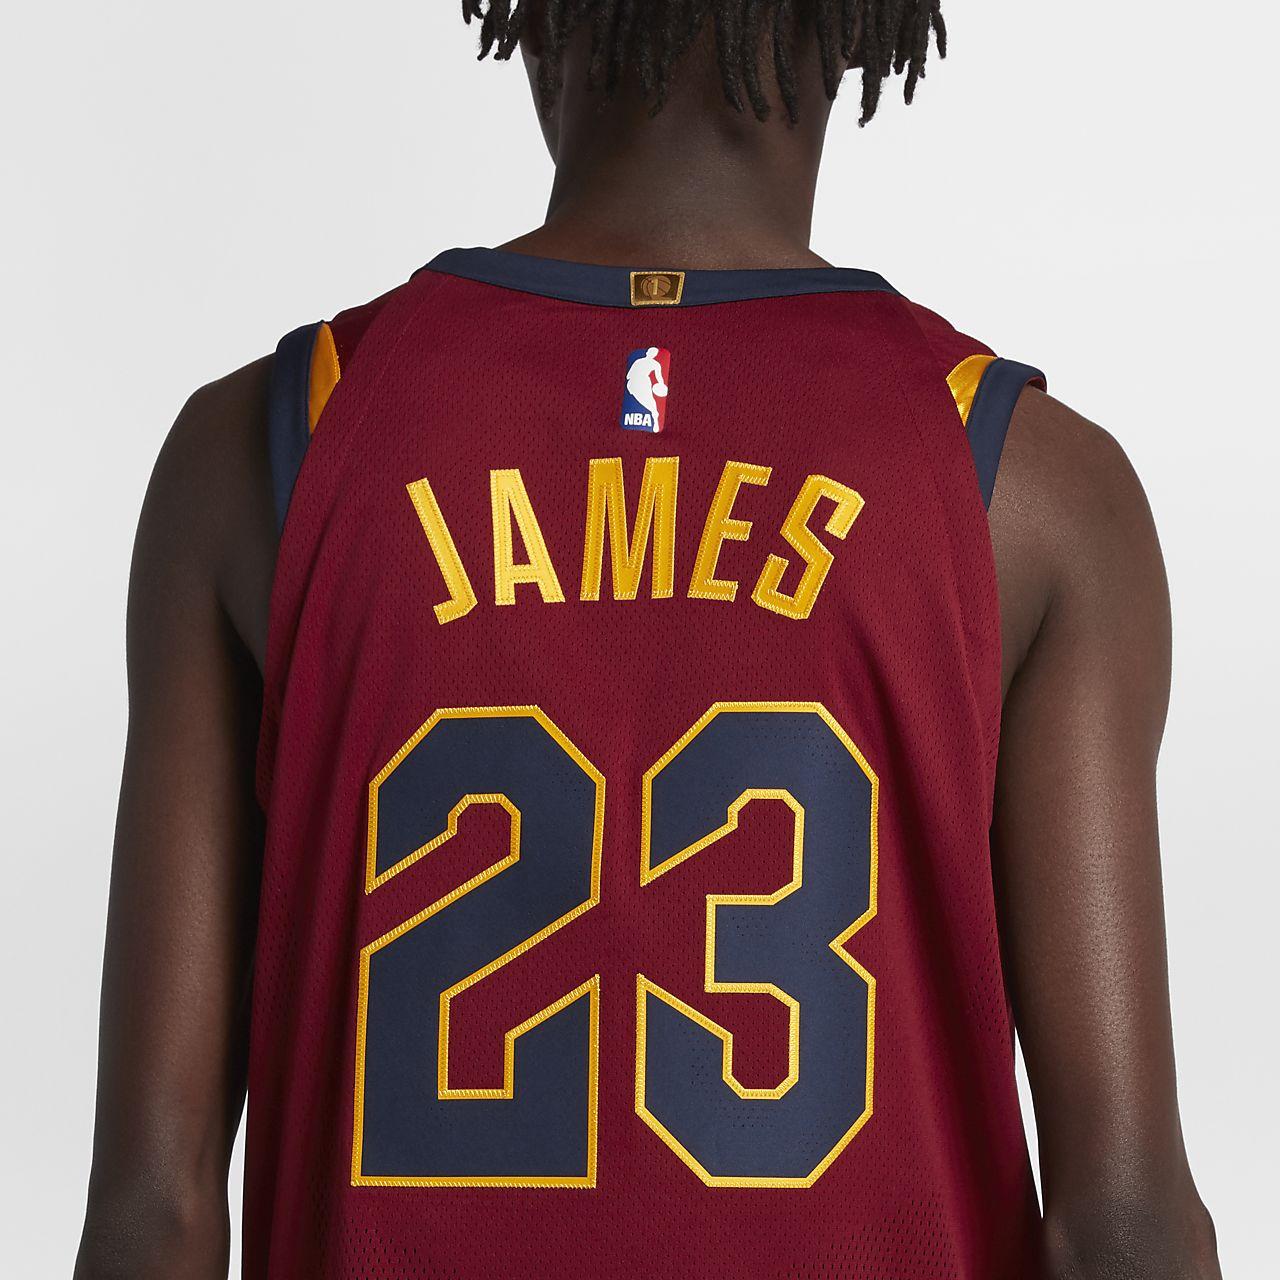 Nike Jerseys Authentique Nba